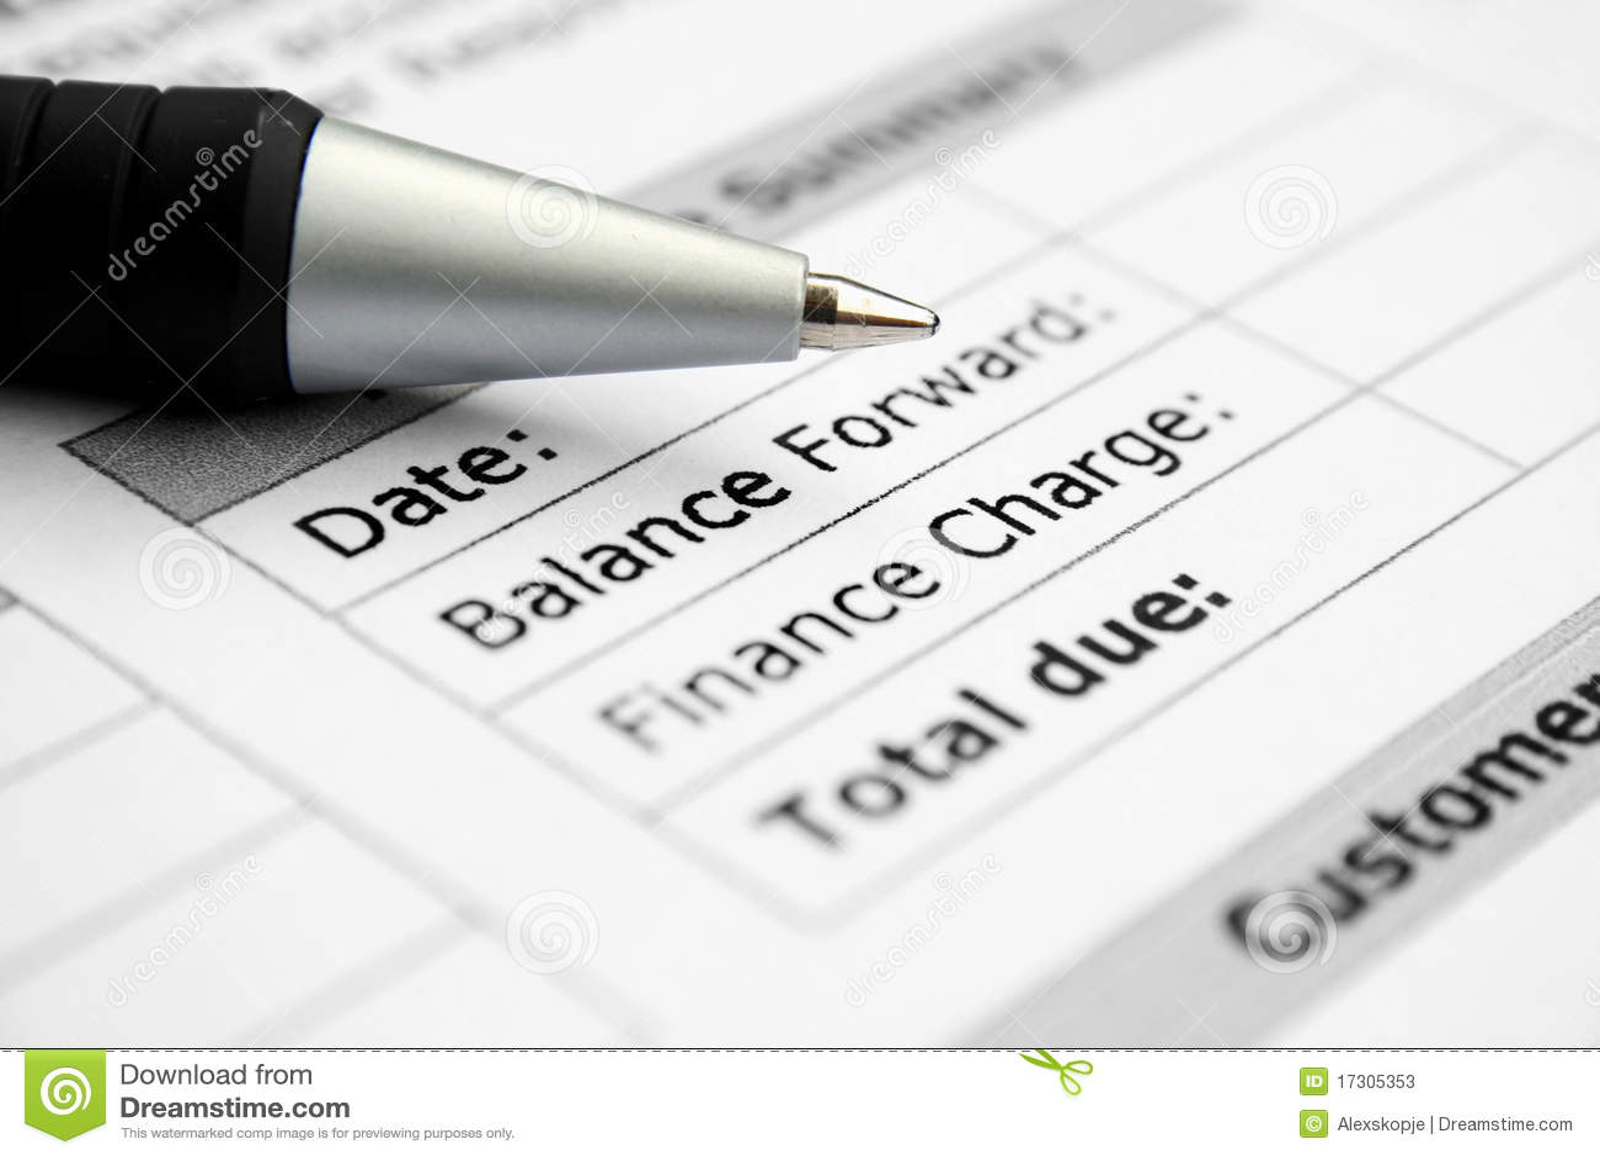 account balance stock image  image of home  credits  cash